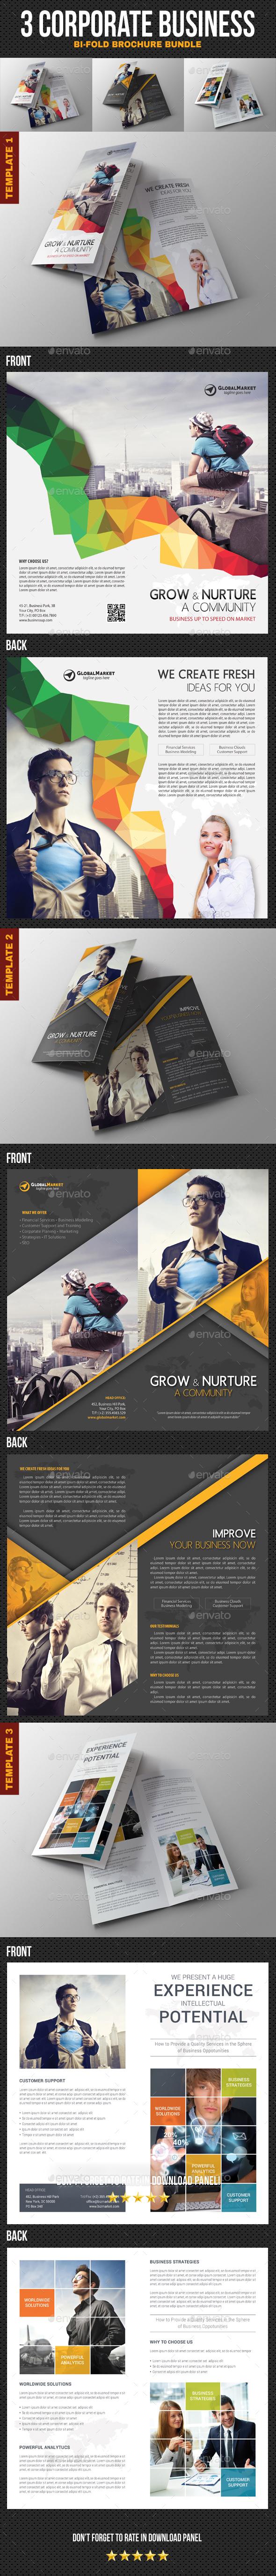 3 Corporate Business Brochure Bundle - Corporate Brochures